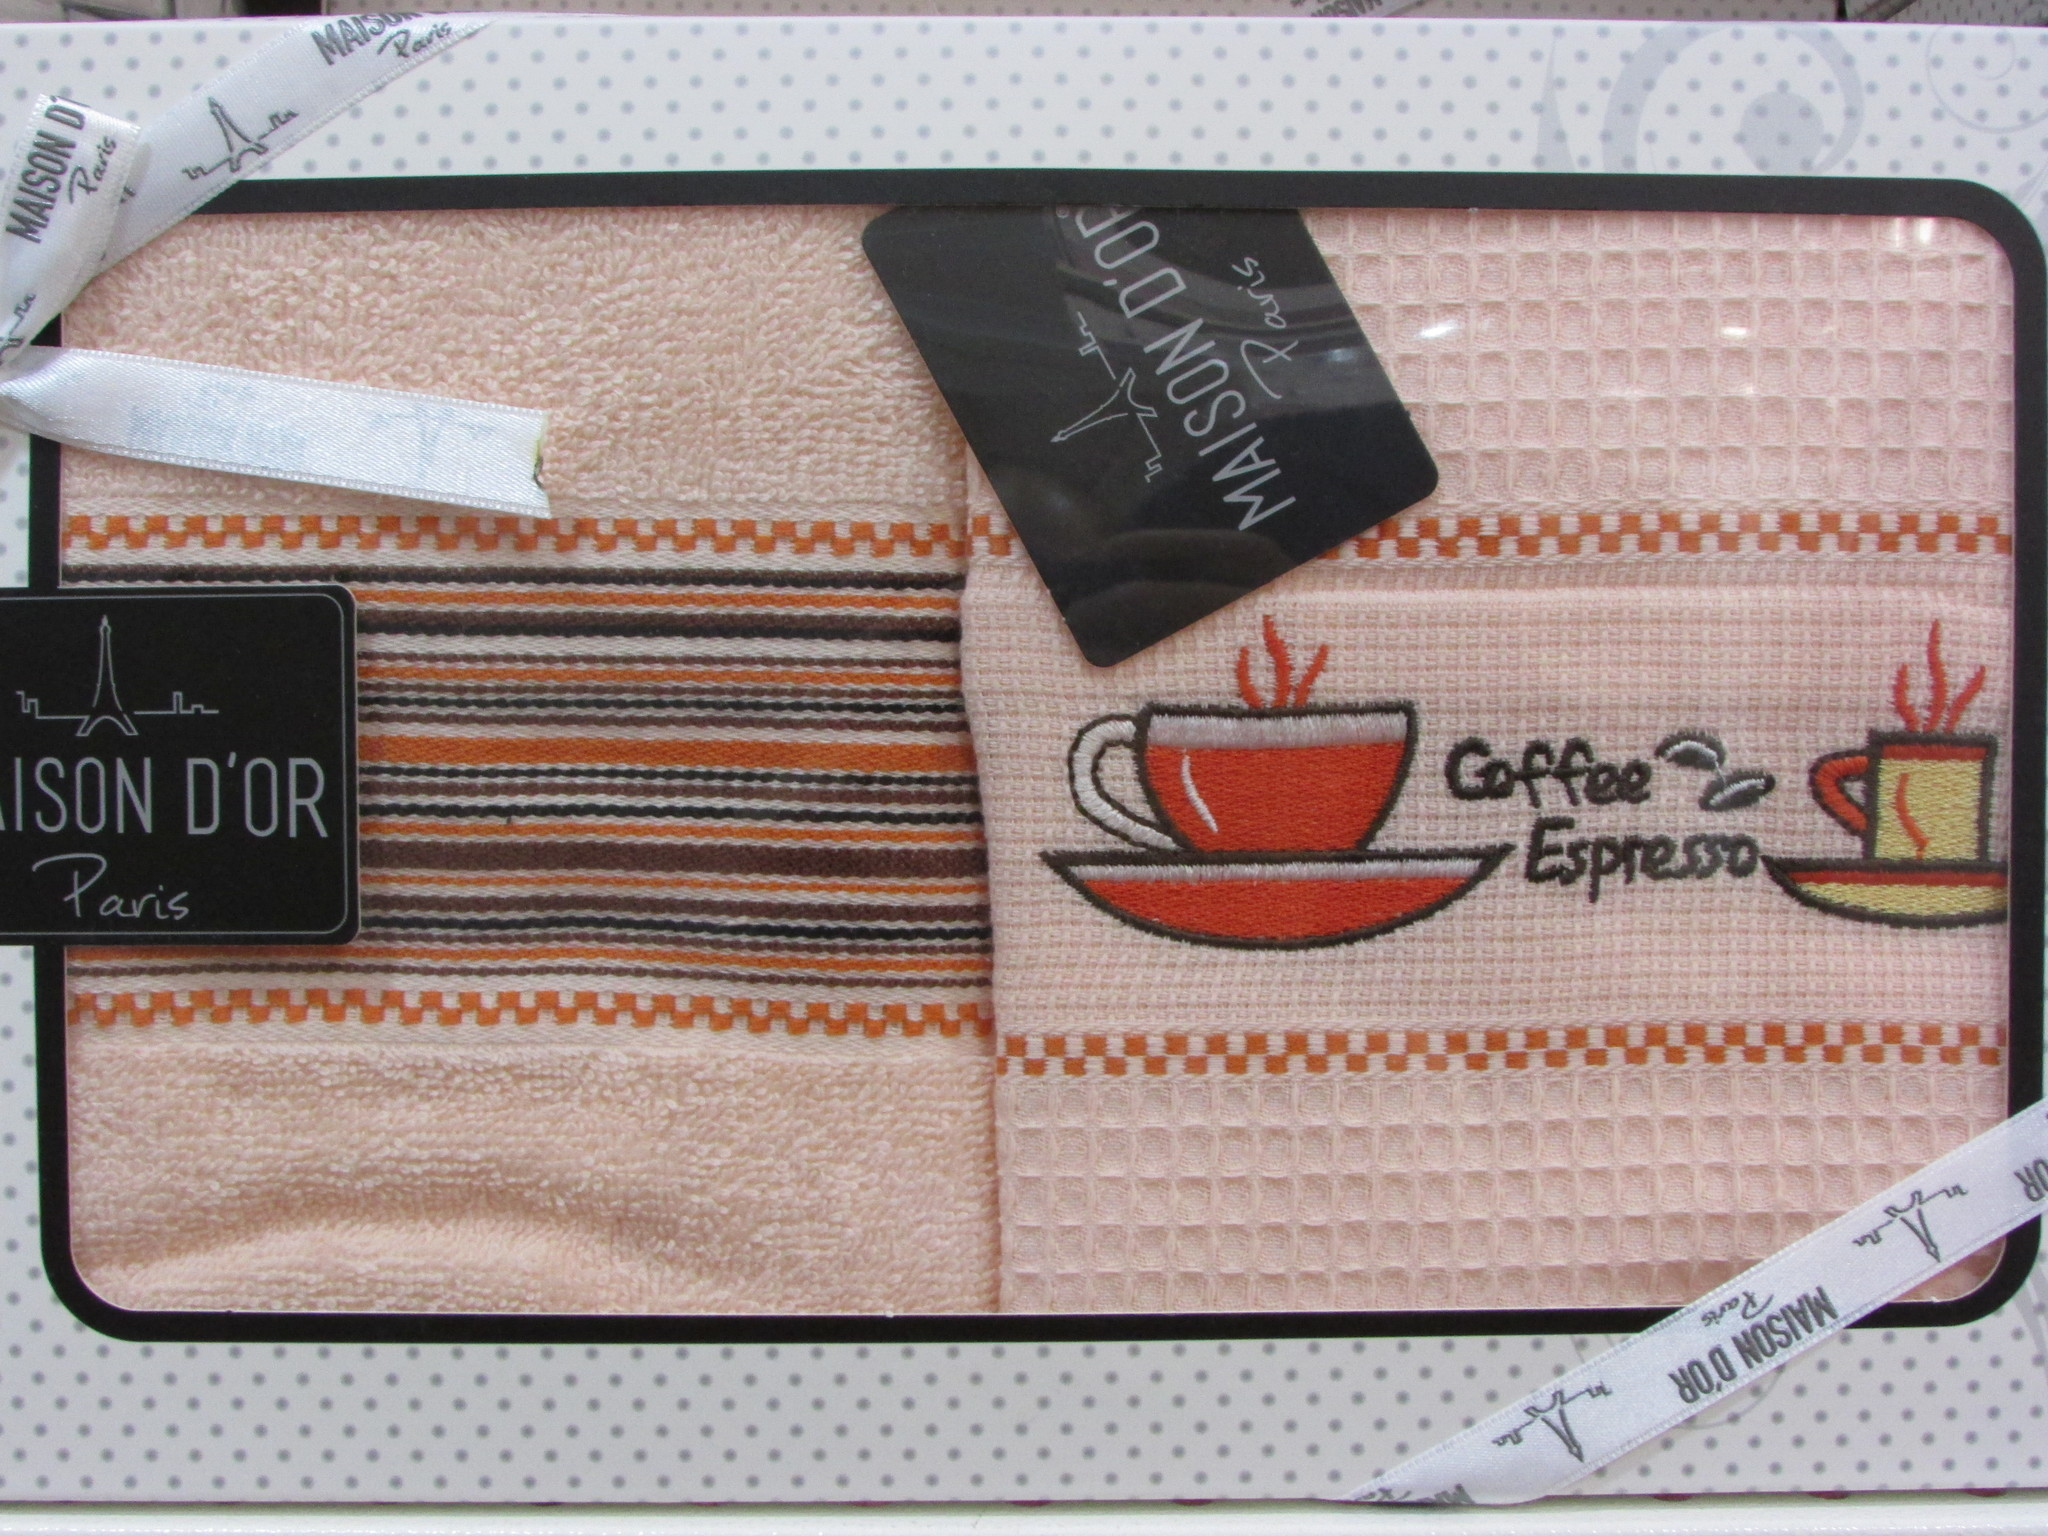 Кухонные полотенца Набор салфеток для кухни TRENDY  ТРЭНДИ  45х70  Maison Dor (Турция) тренди_персик.JPG